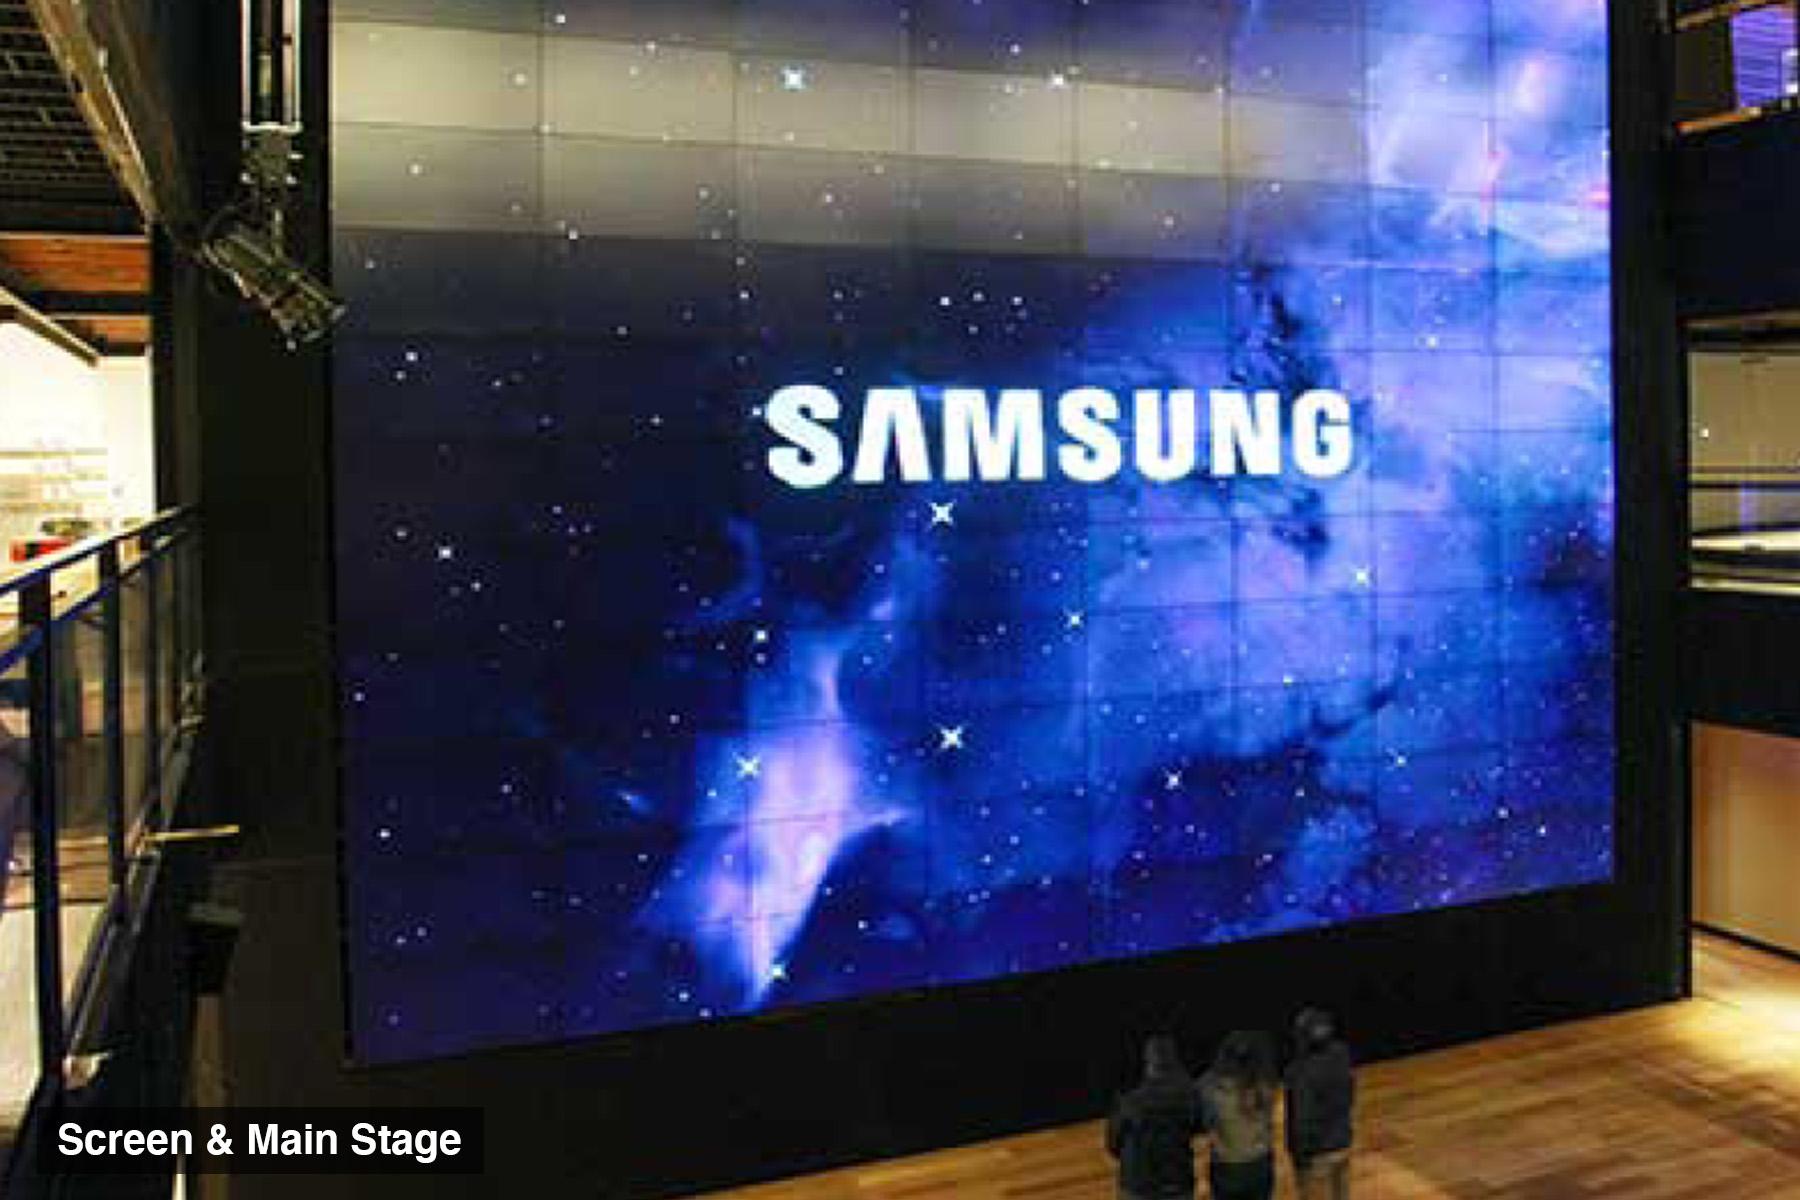 Samsung 837 Pic 12